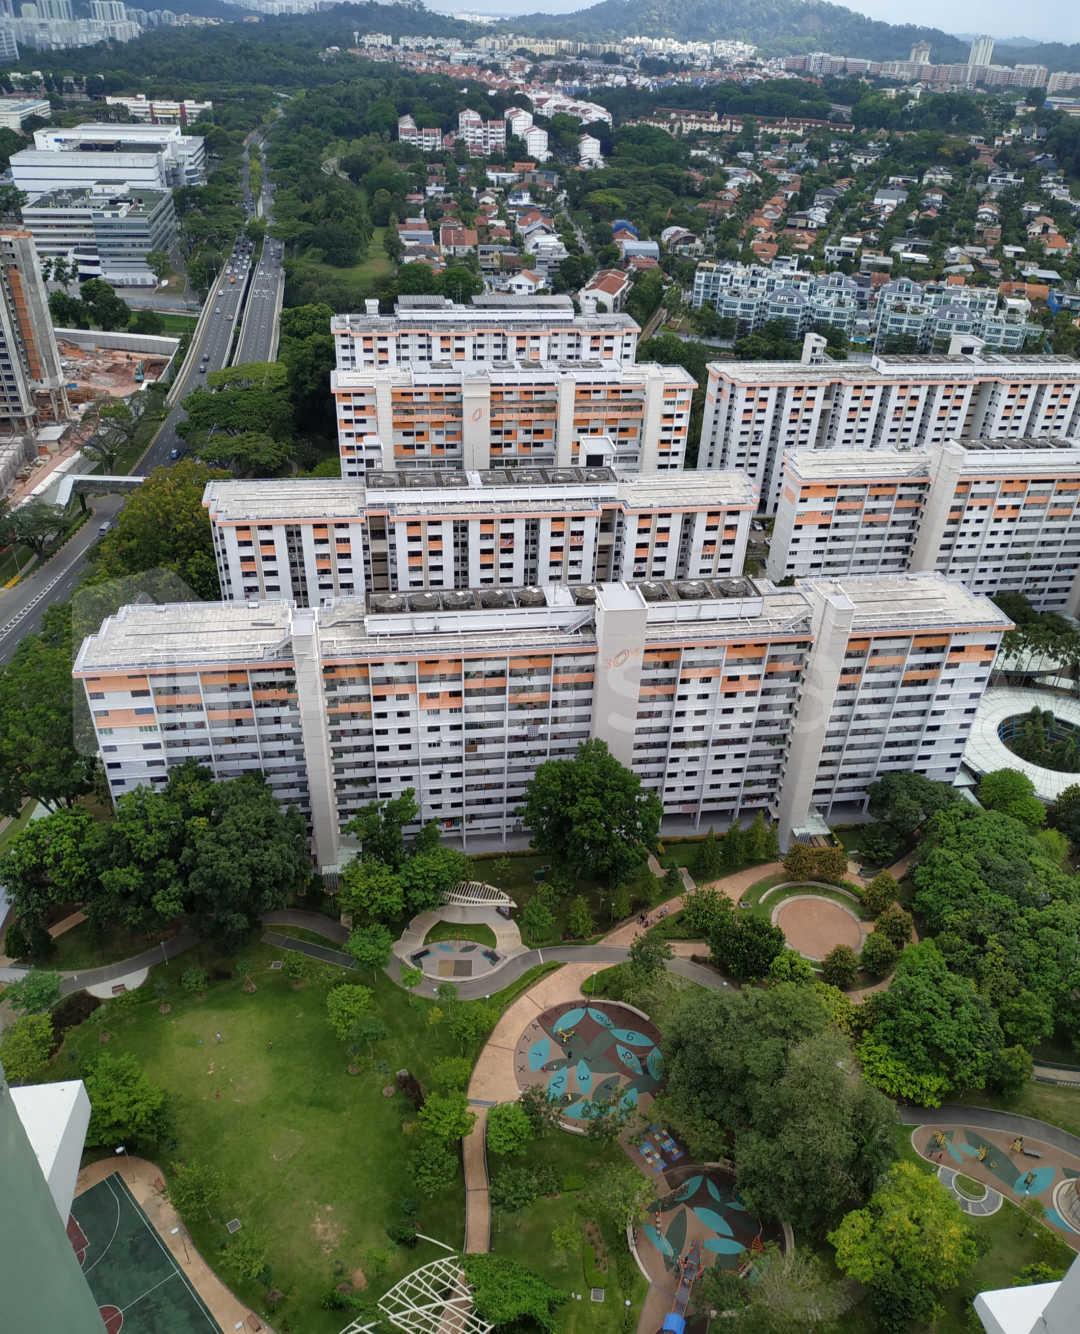 312B Clementi Avenue 4, District 05 Singapore